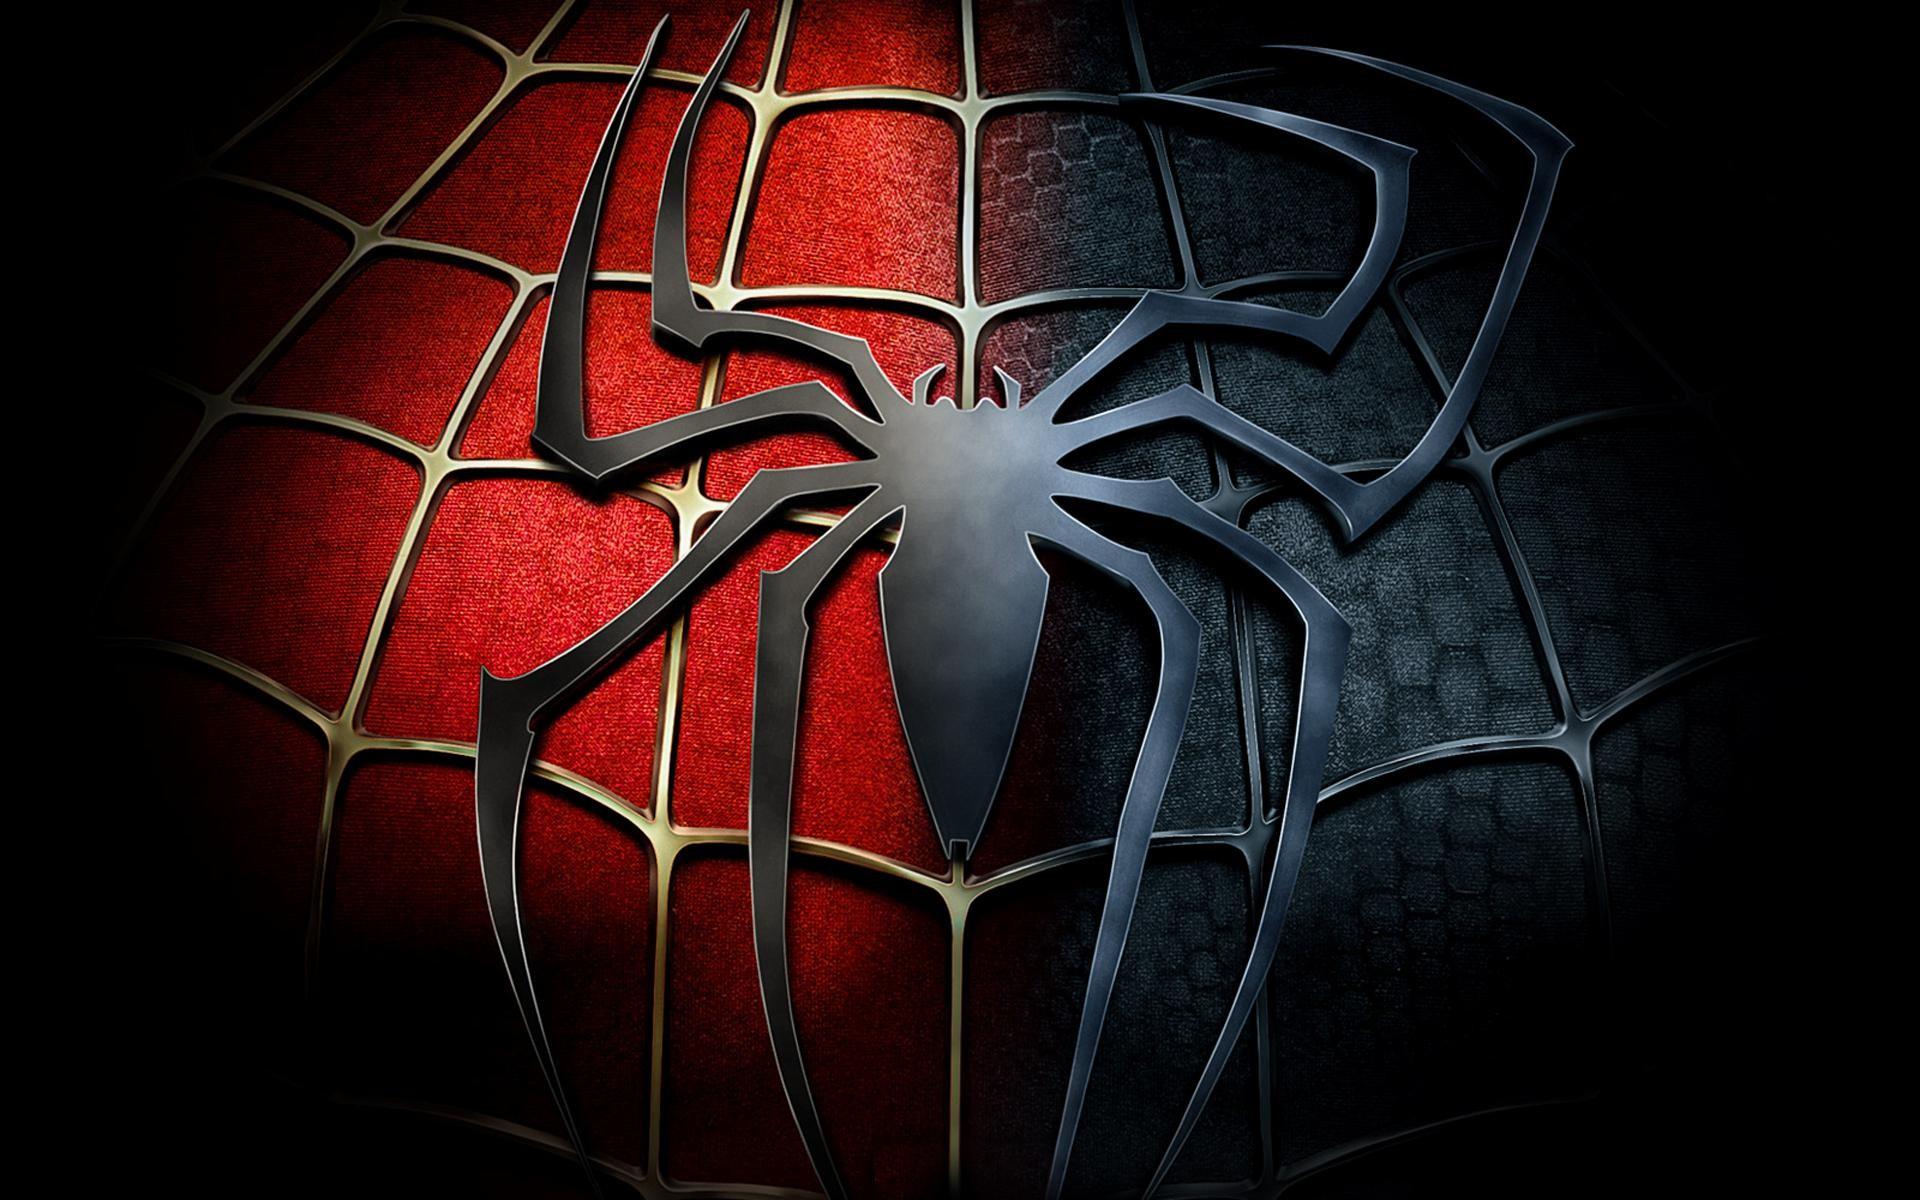 wallpaper.wiki-Black-Spiderman-Iphone-HD-Background-PIC-WPD0011573